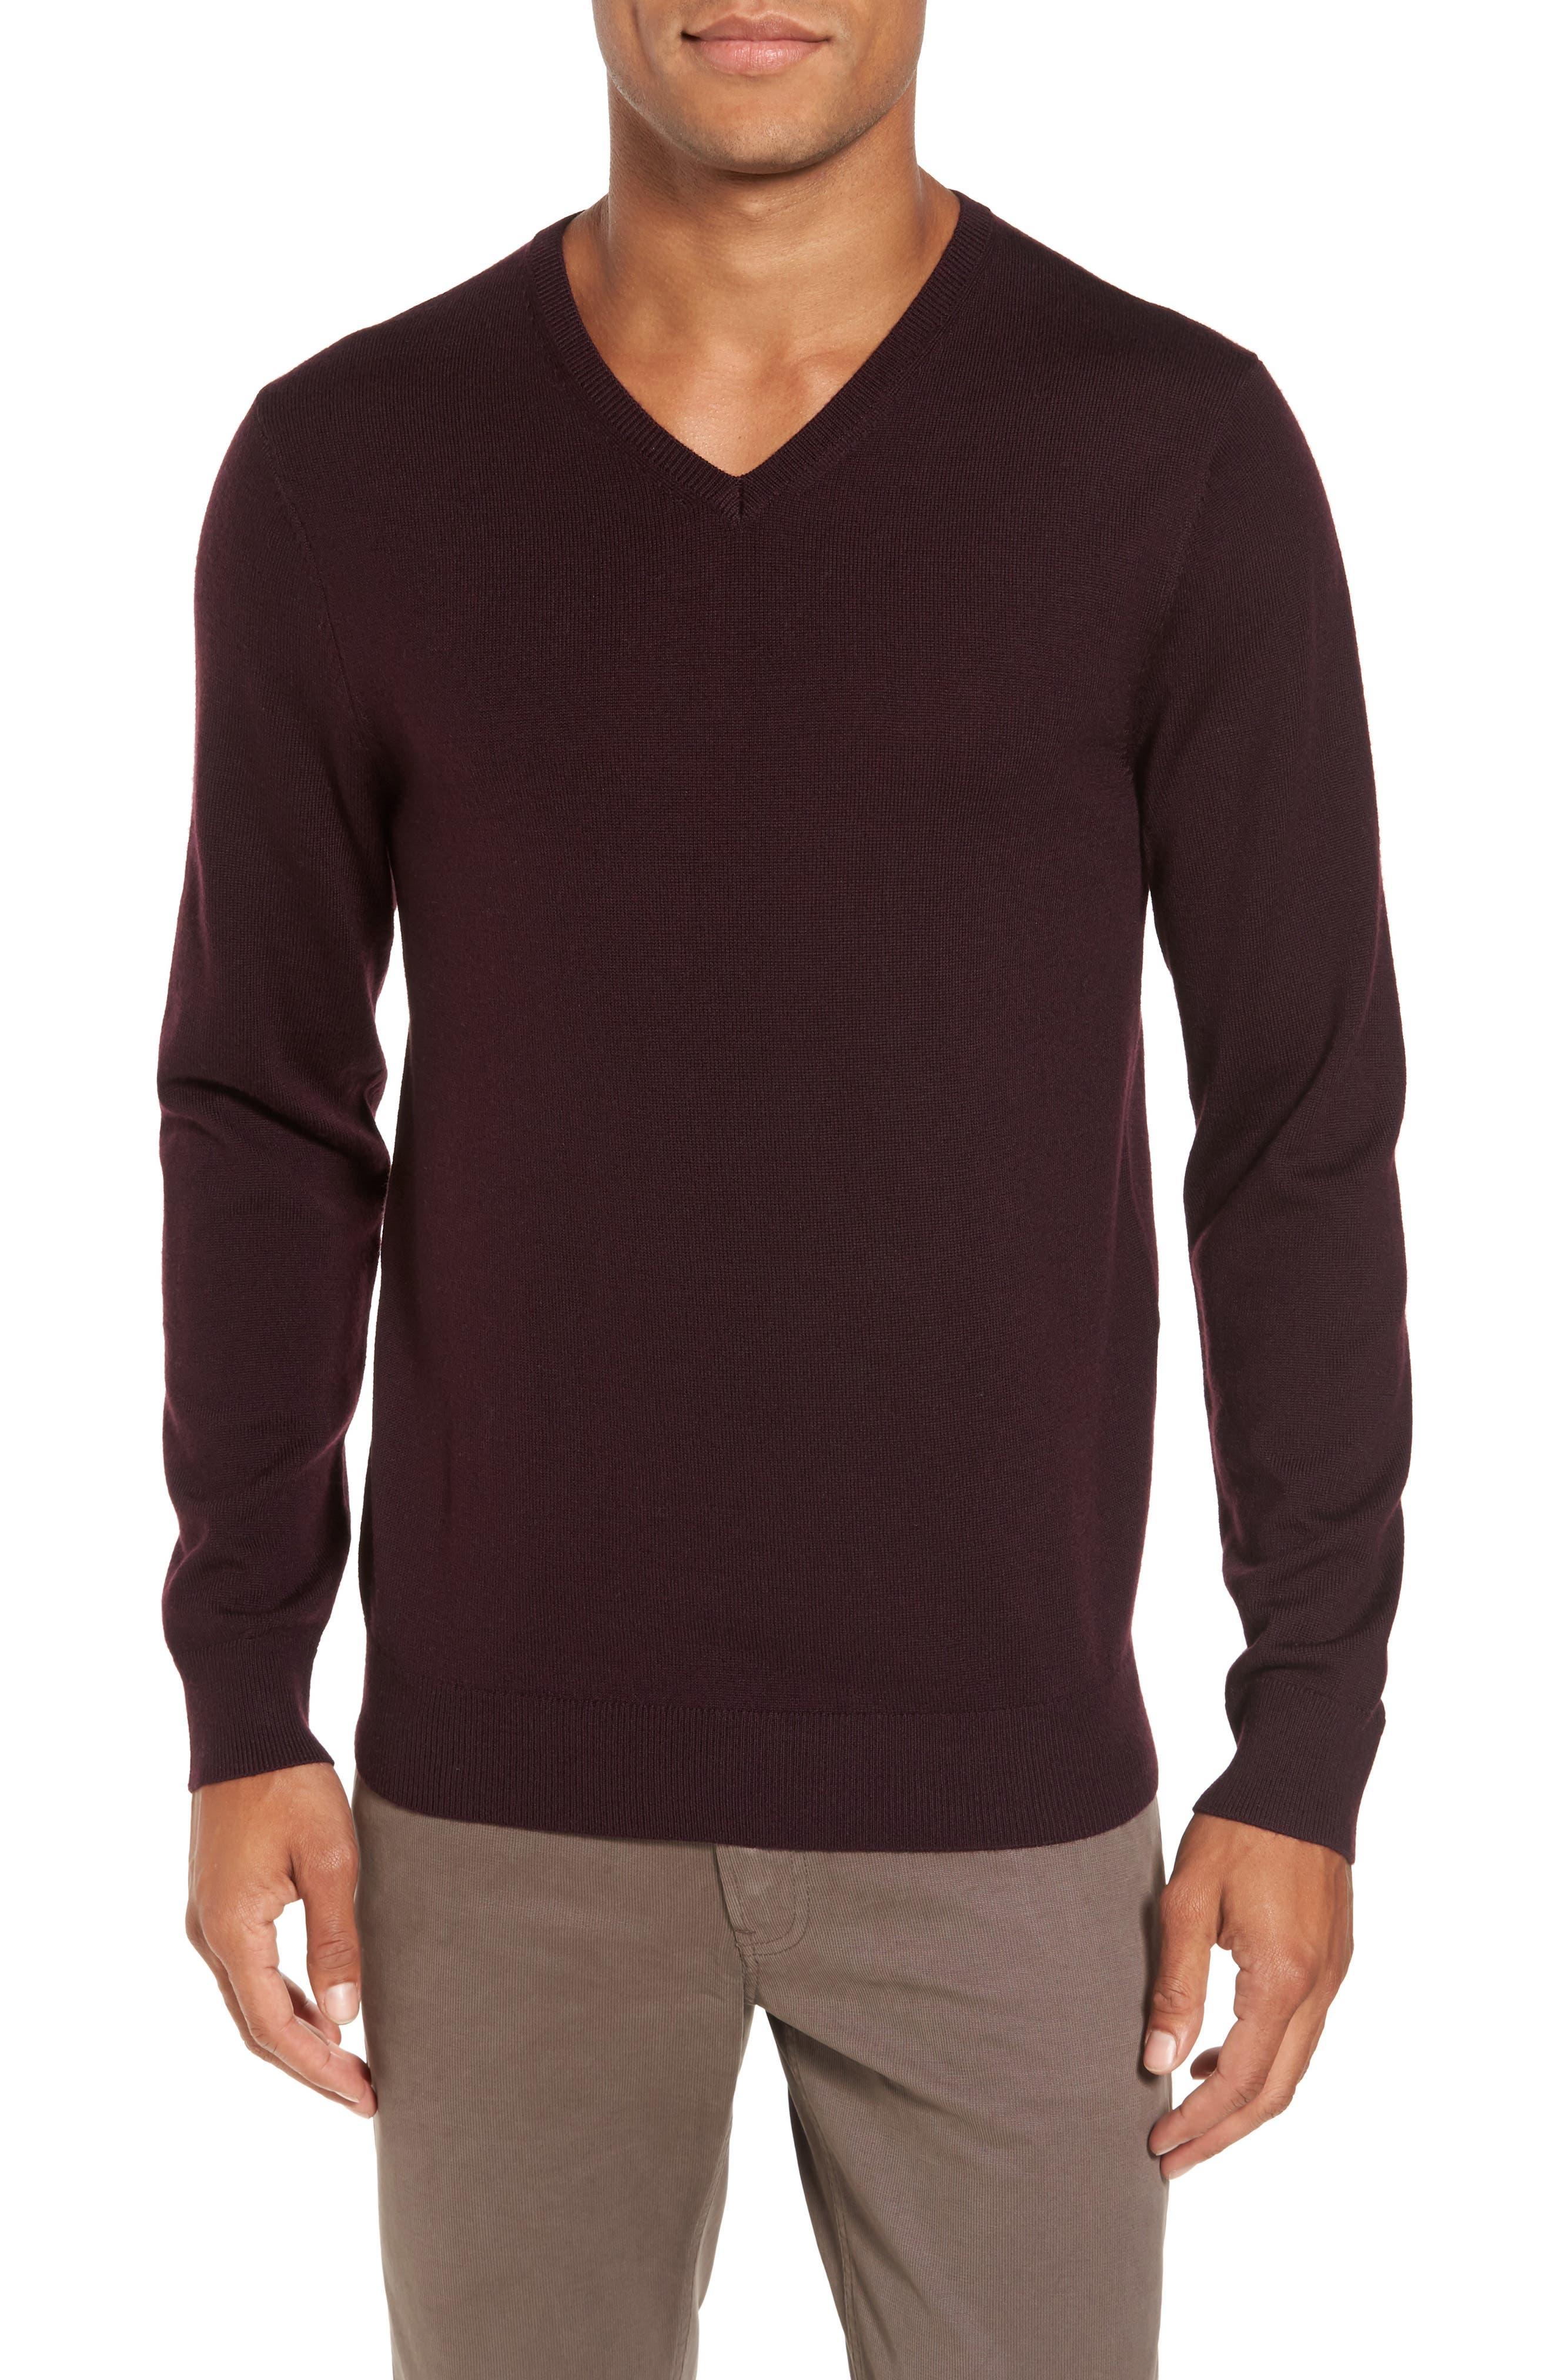 Bonobos Merino V-Neck Sweater